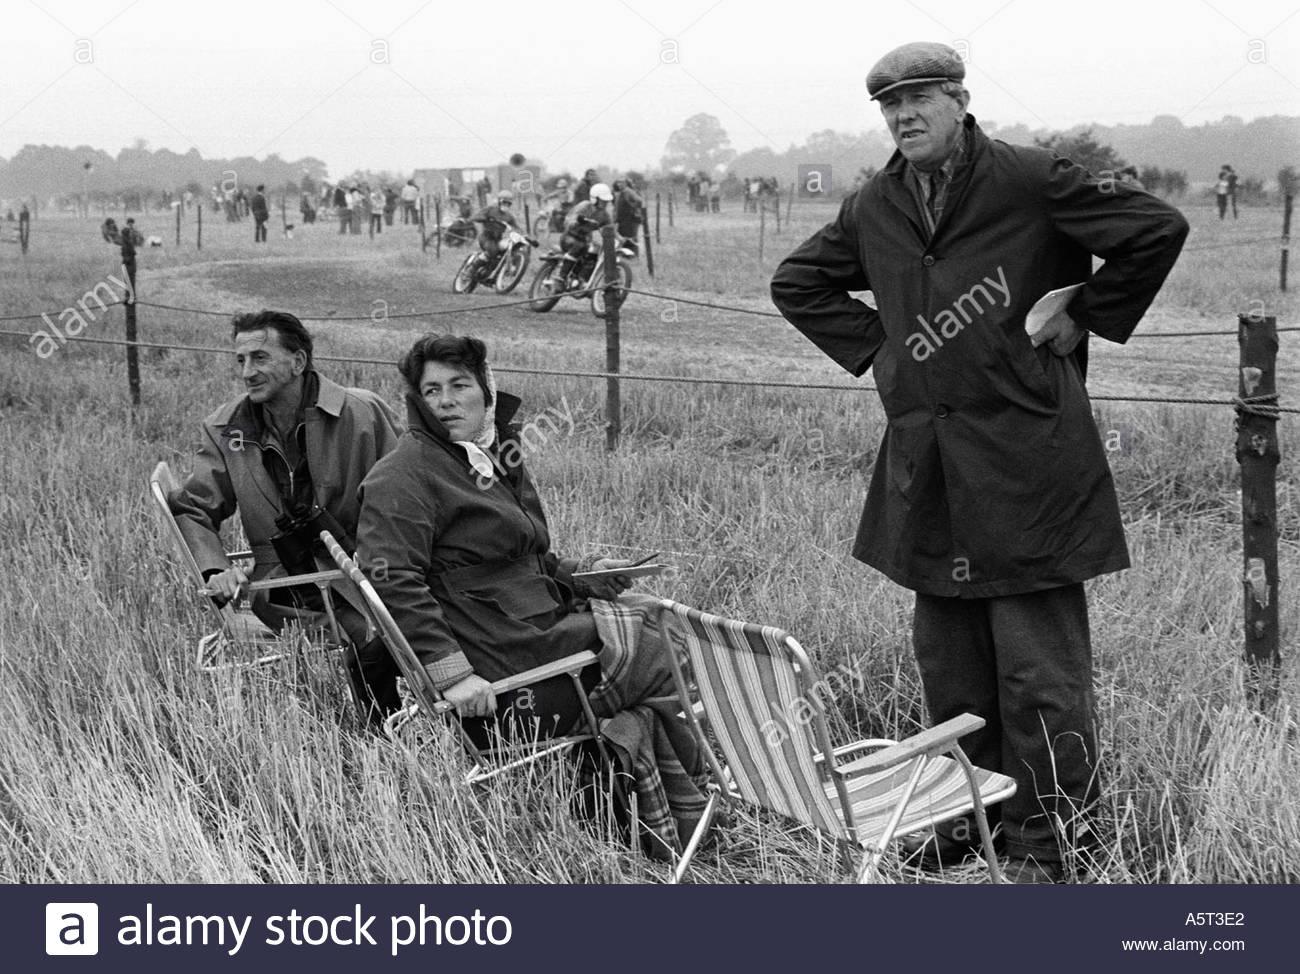 Motorcycle scramble in Essex, UK - Stock Image